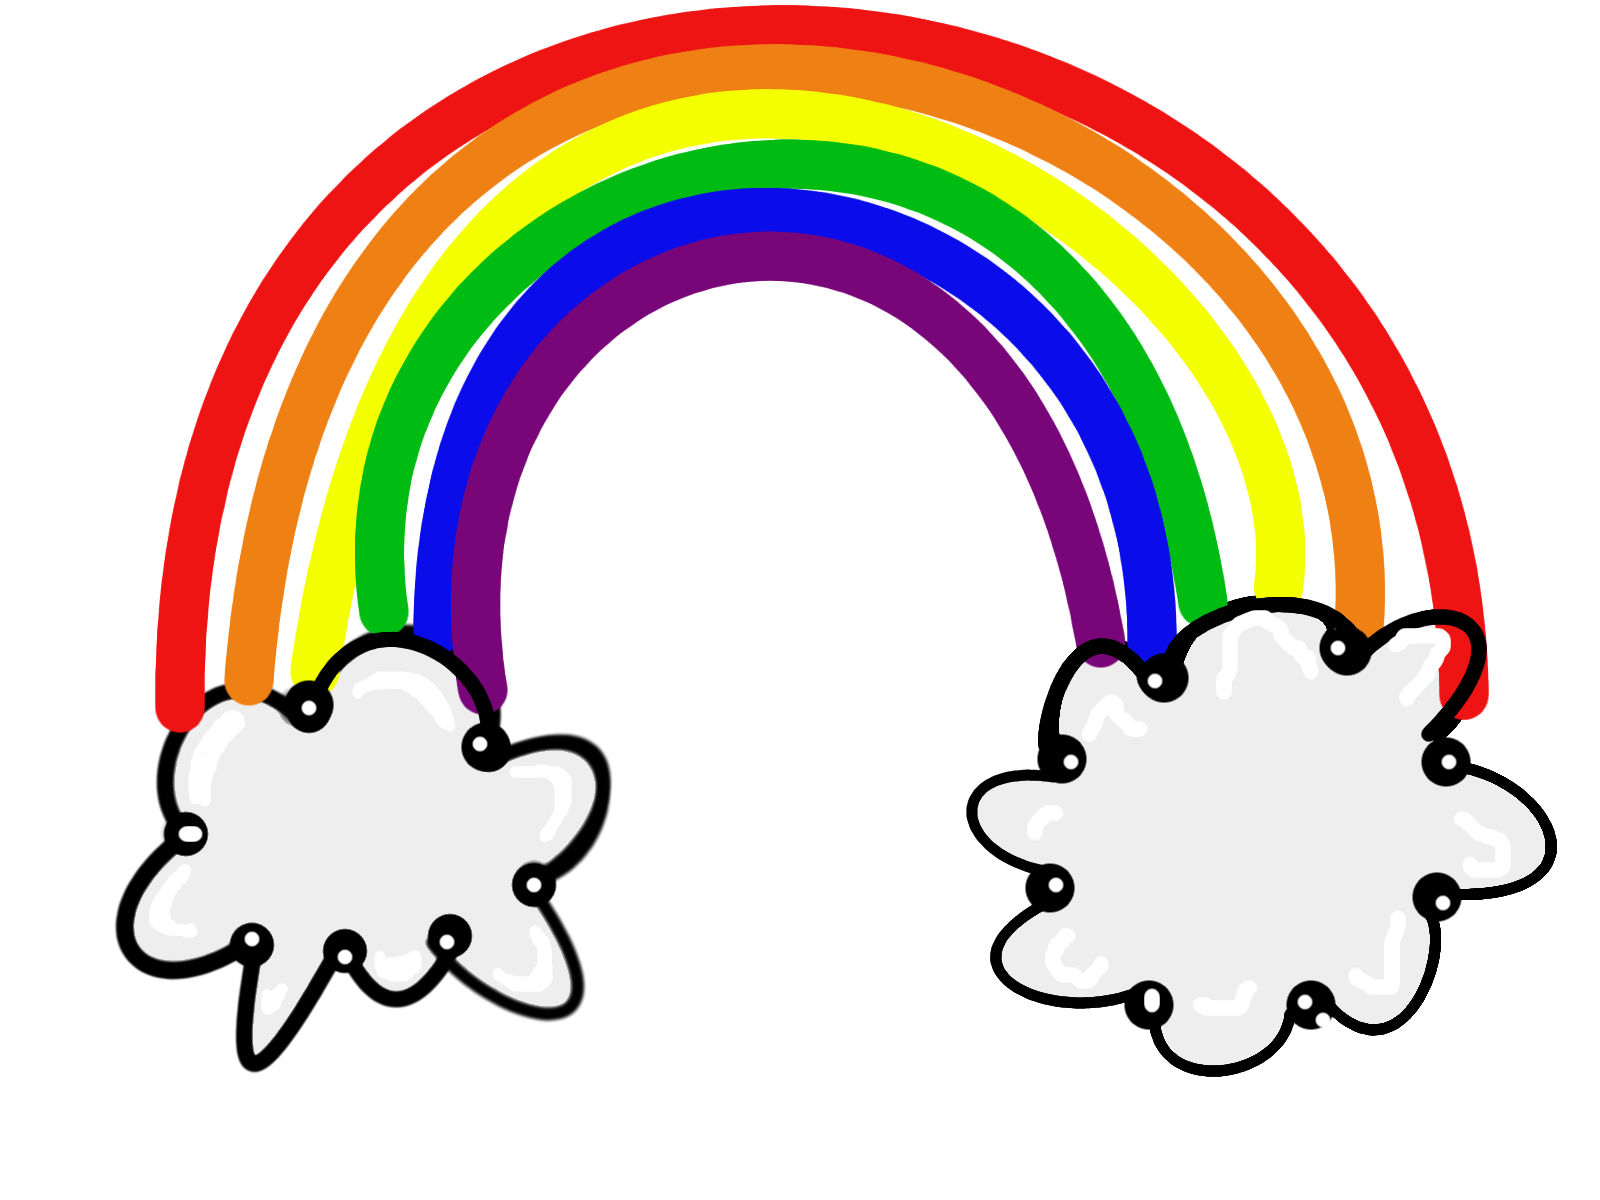 1600x1200 Rainbow Clipart Image Clip Art Of A Happy Sunshine